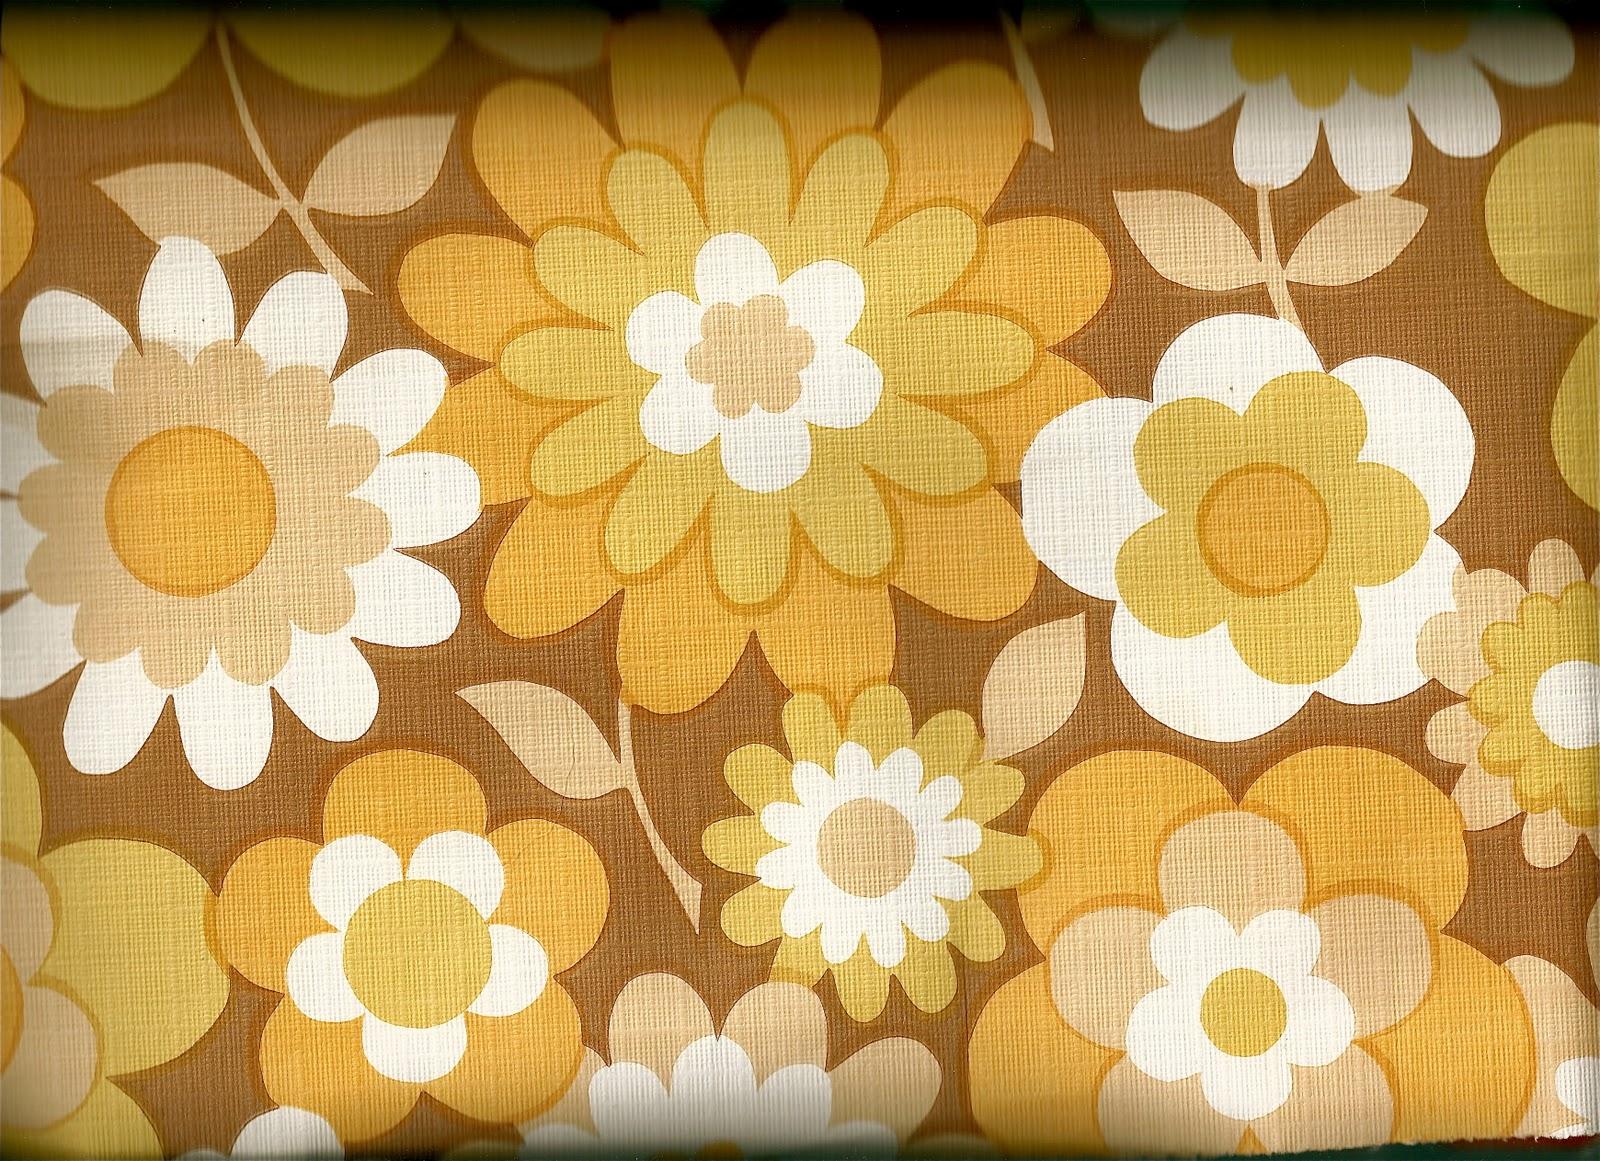 70s wallpaper patterns a - photo #36